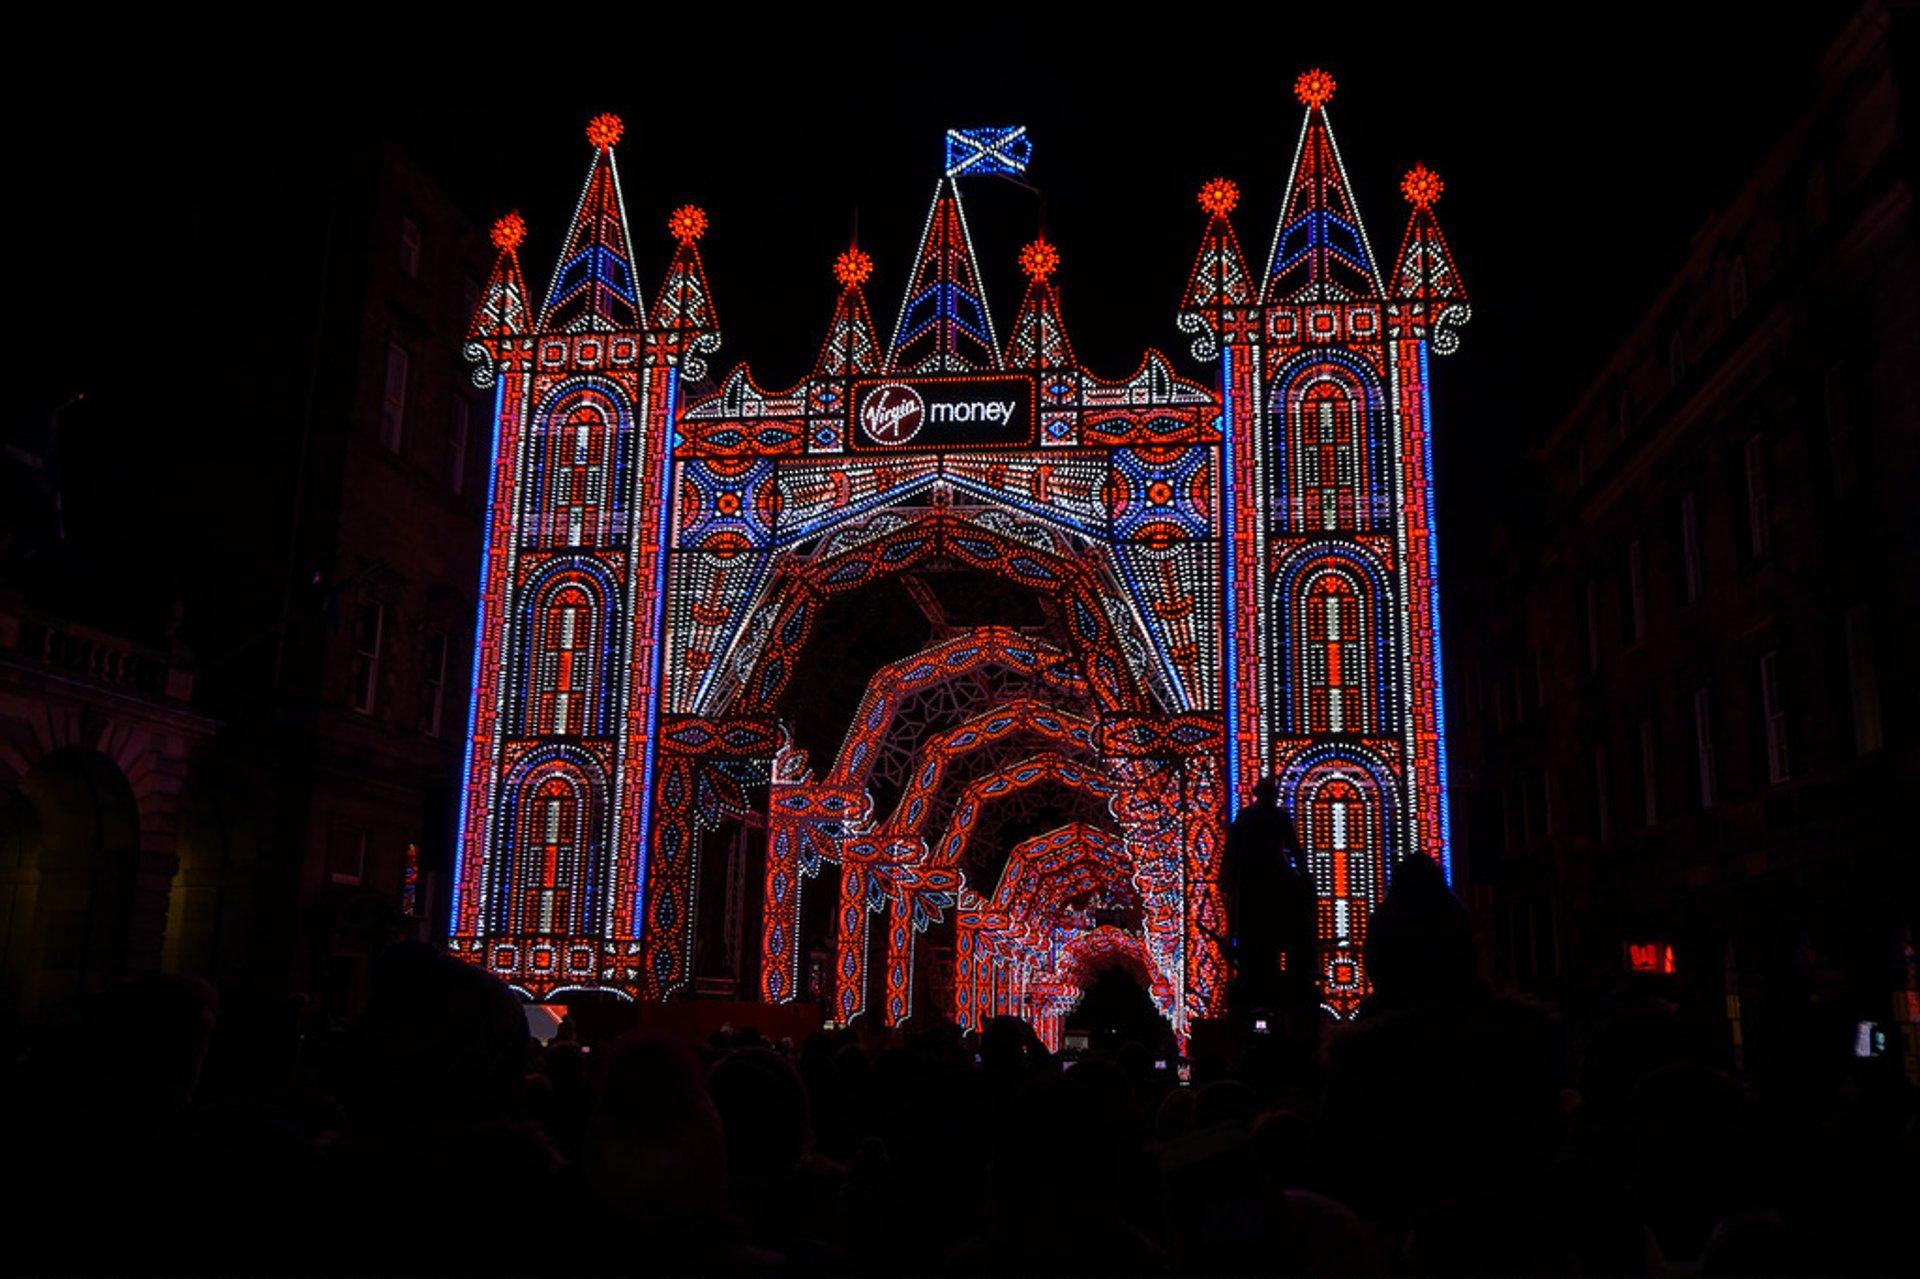 Christmas Lights in Edinburgh - Best Season 2019